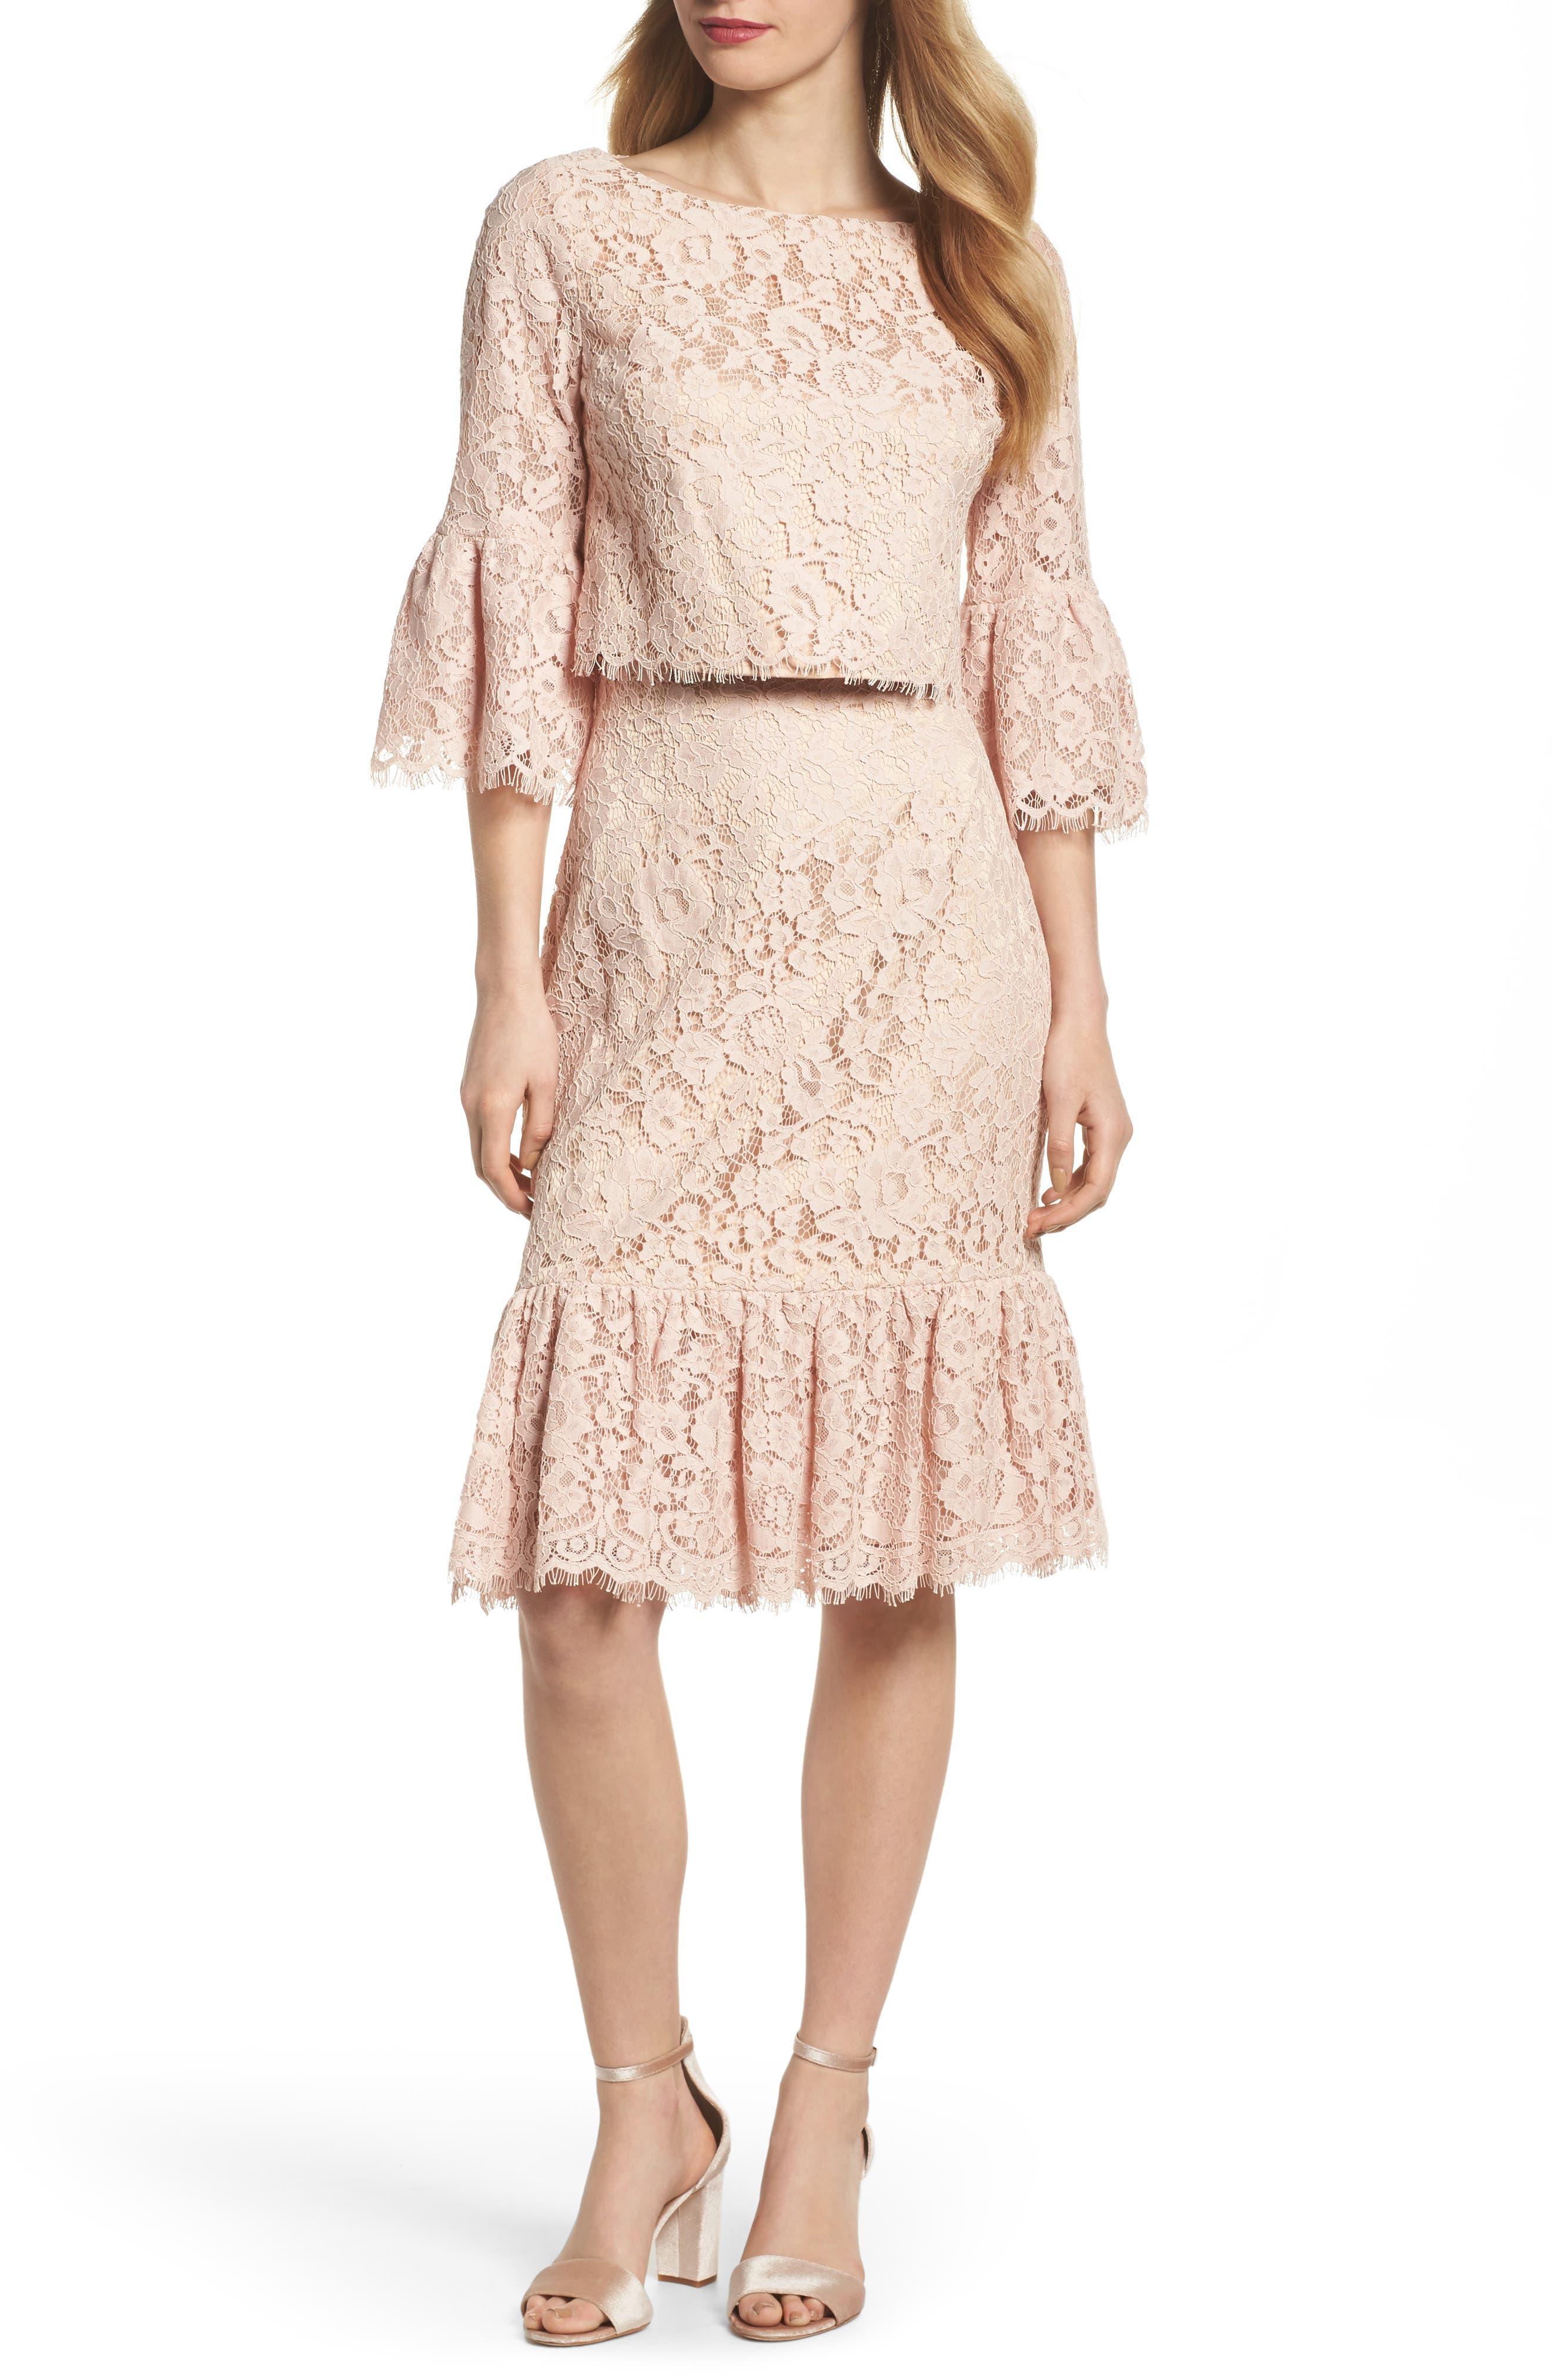 Alternate Image 1 Selected - Eliza J Ruffle Trim Lace Two-Piece Dress